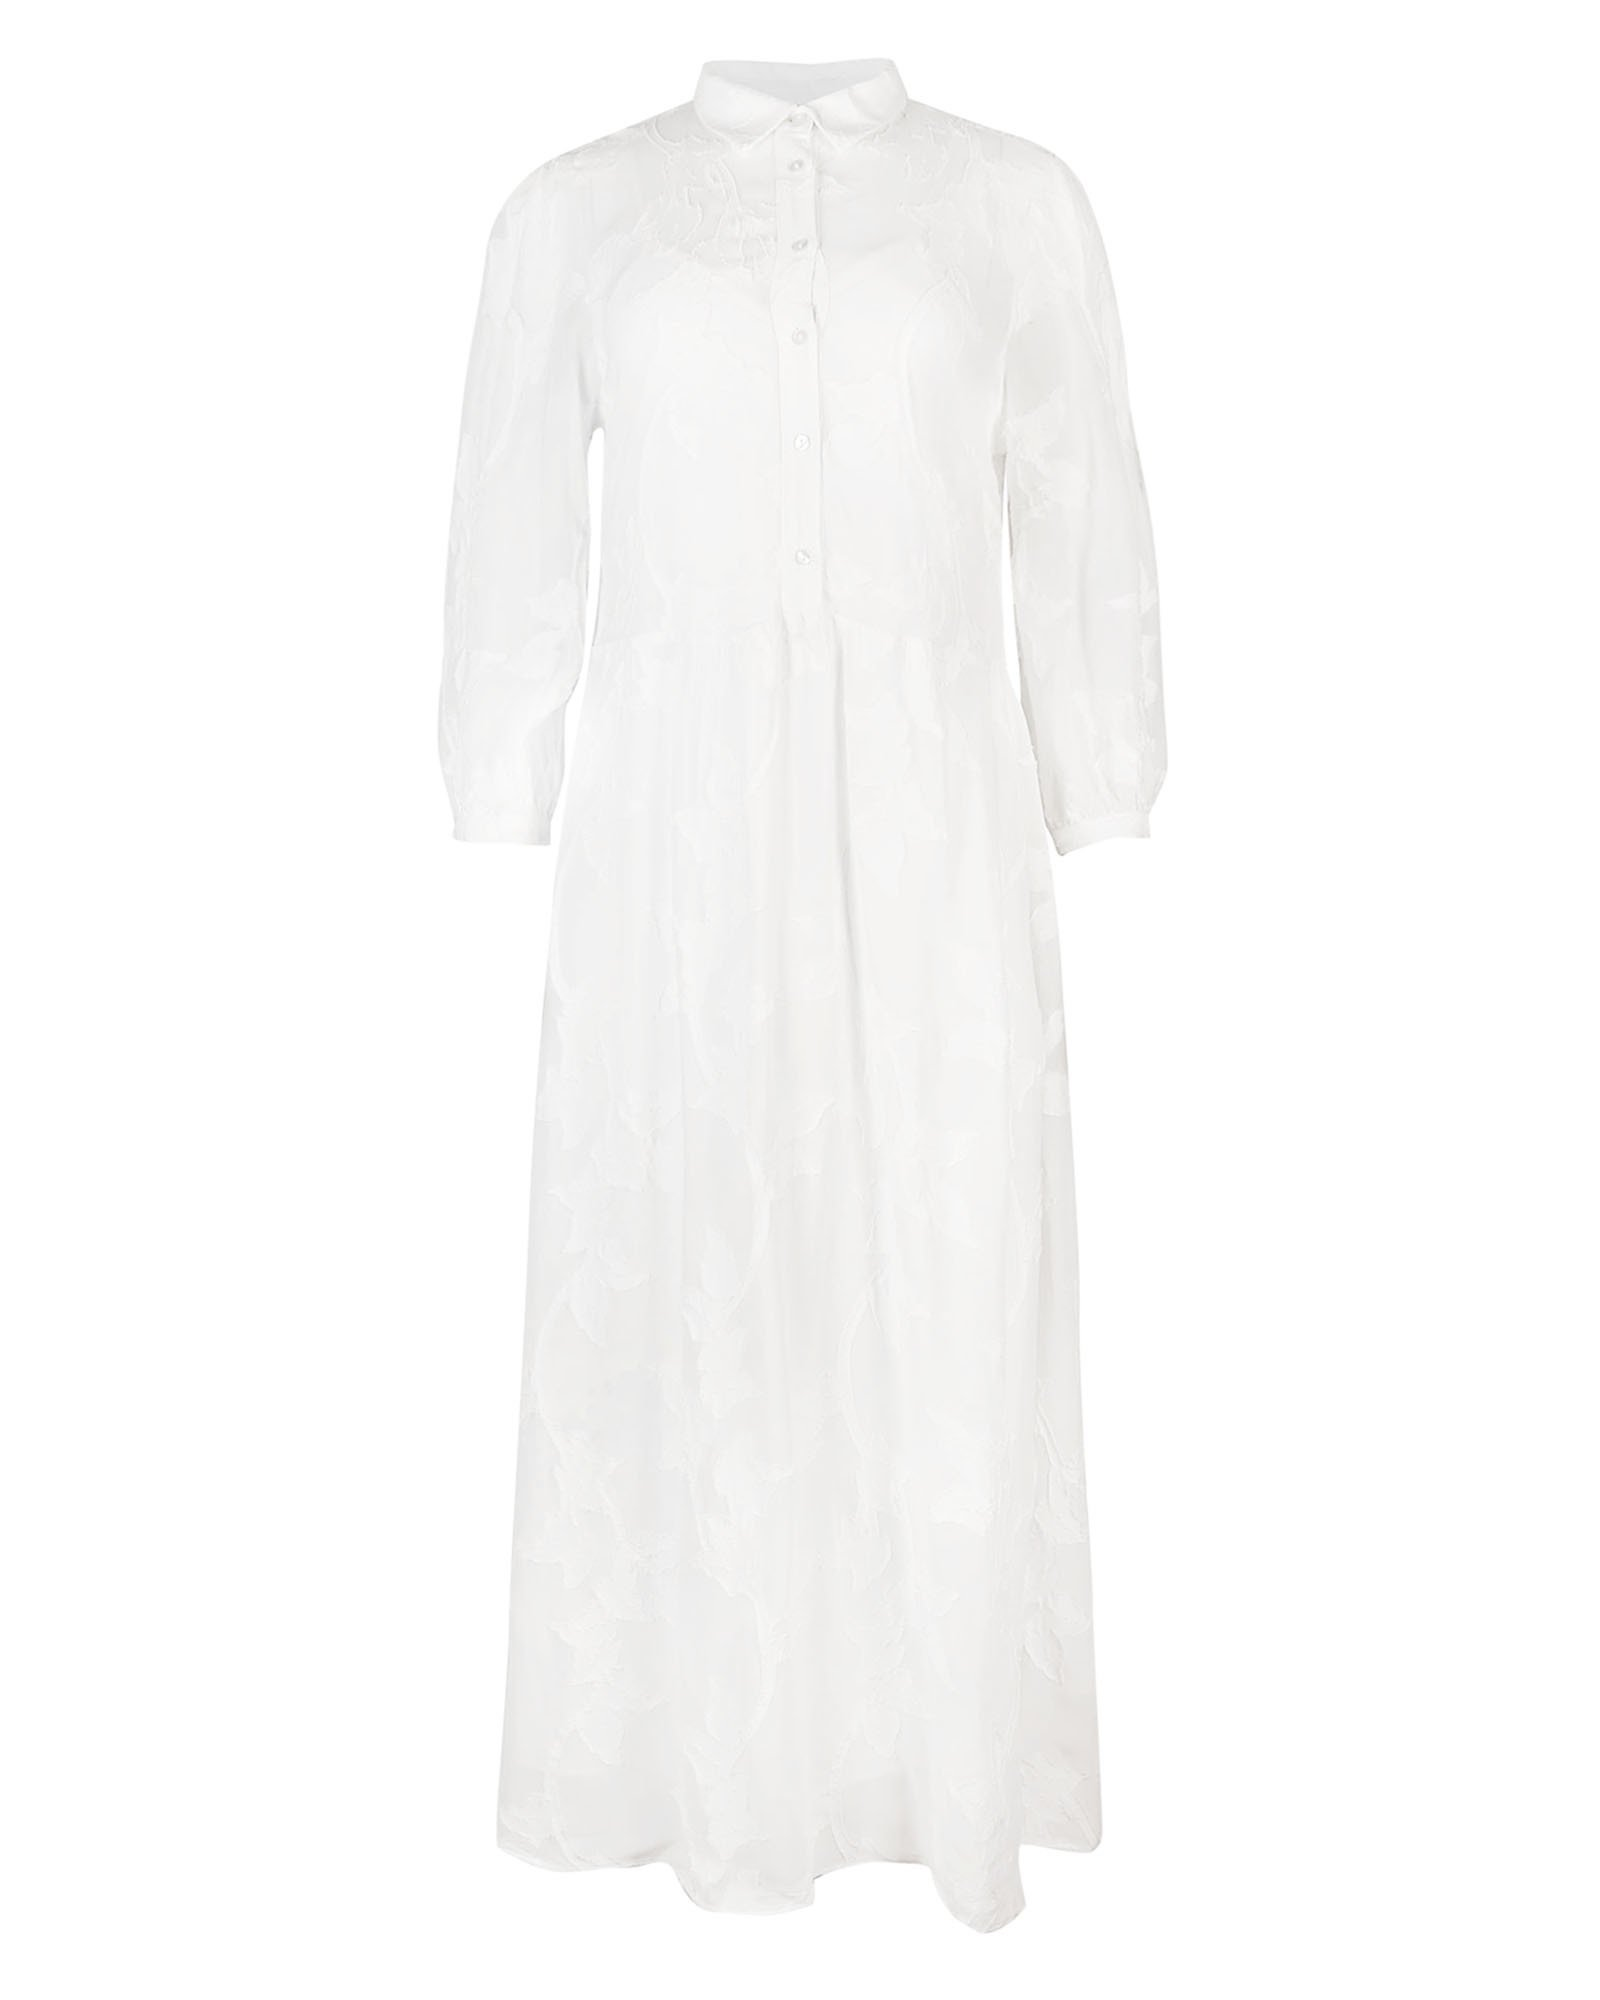 Floral Interest White Maxi Shirt Dress